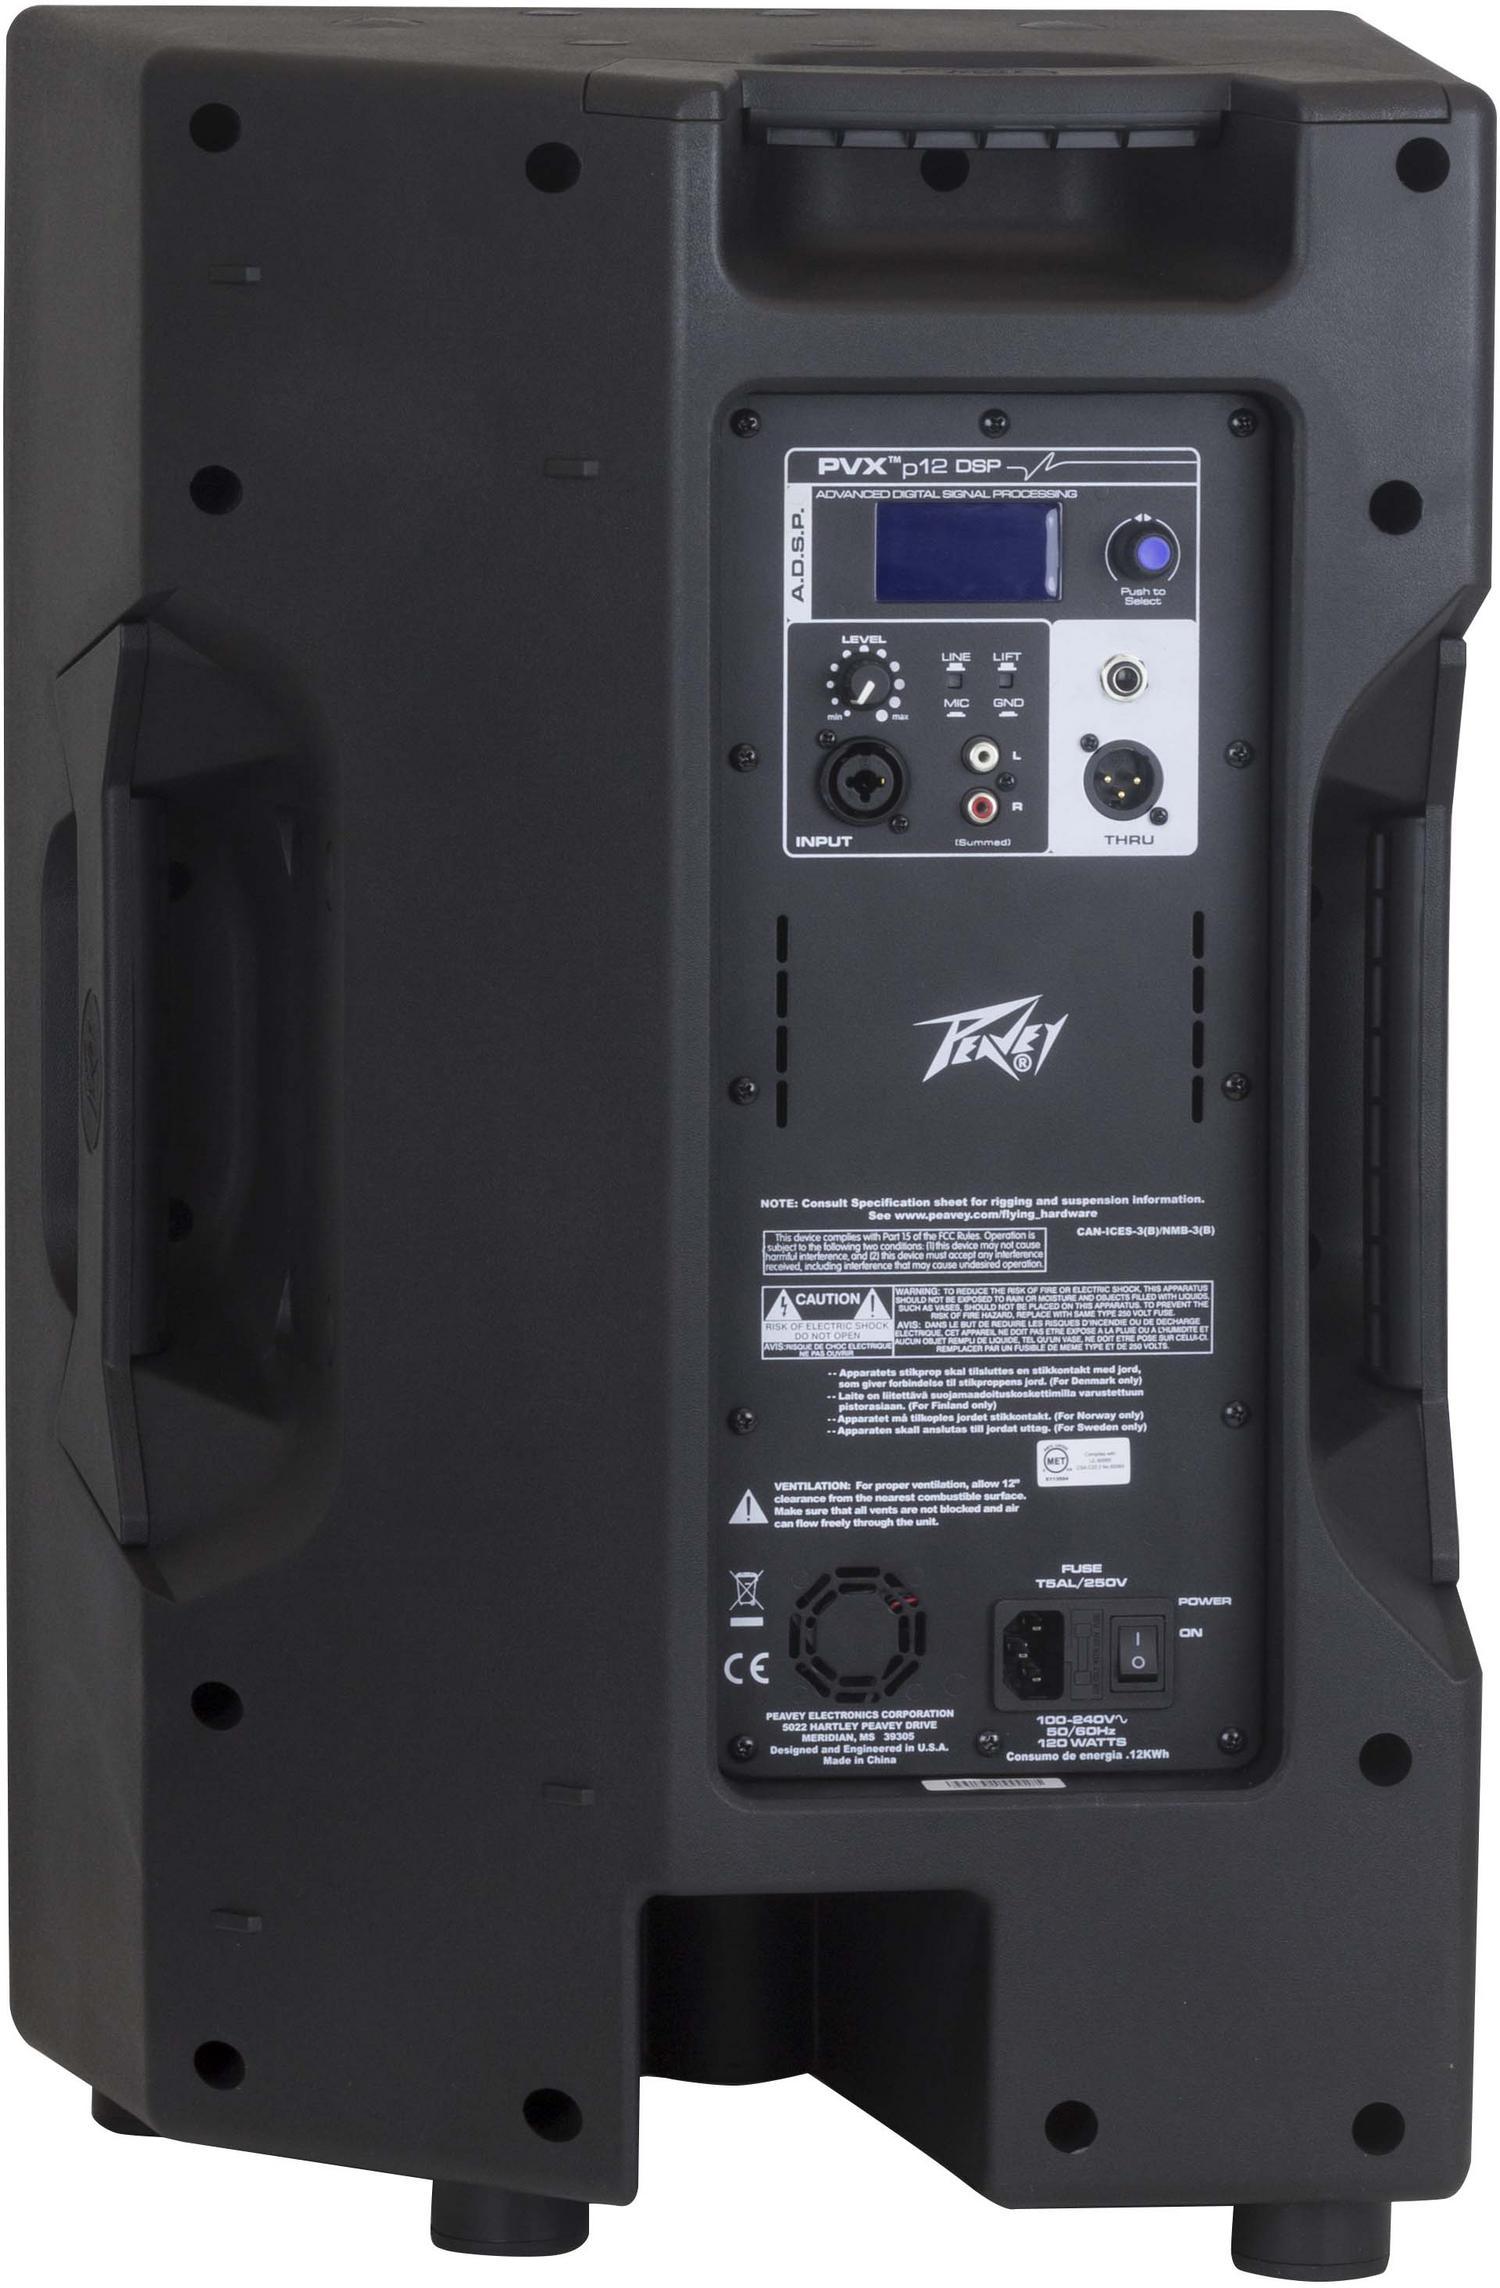 Peavey PVXp 15 Active Enclosure Speaker back panel view